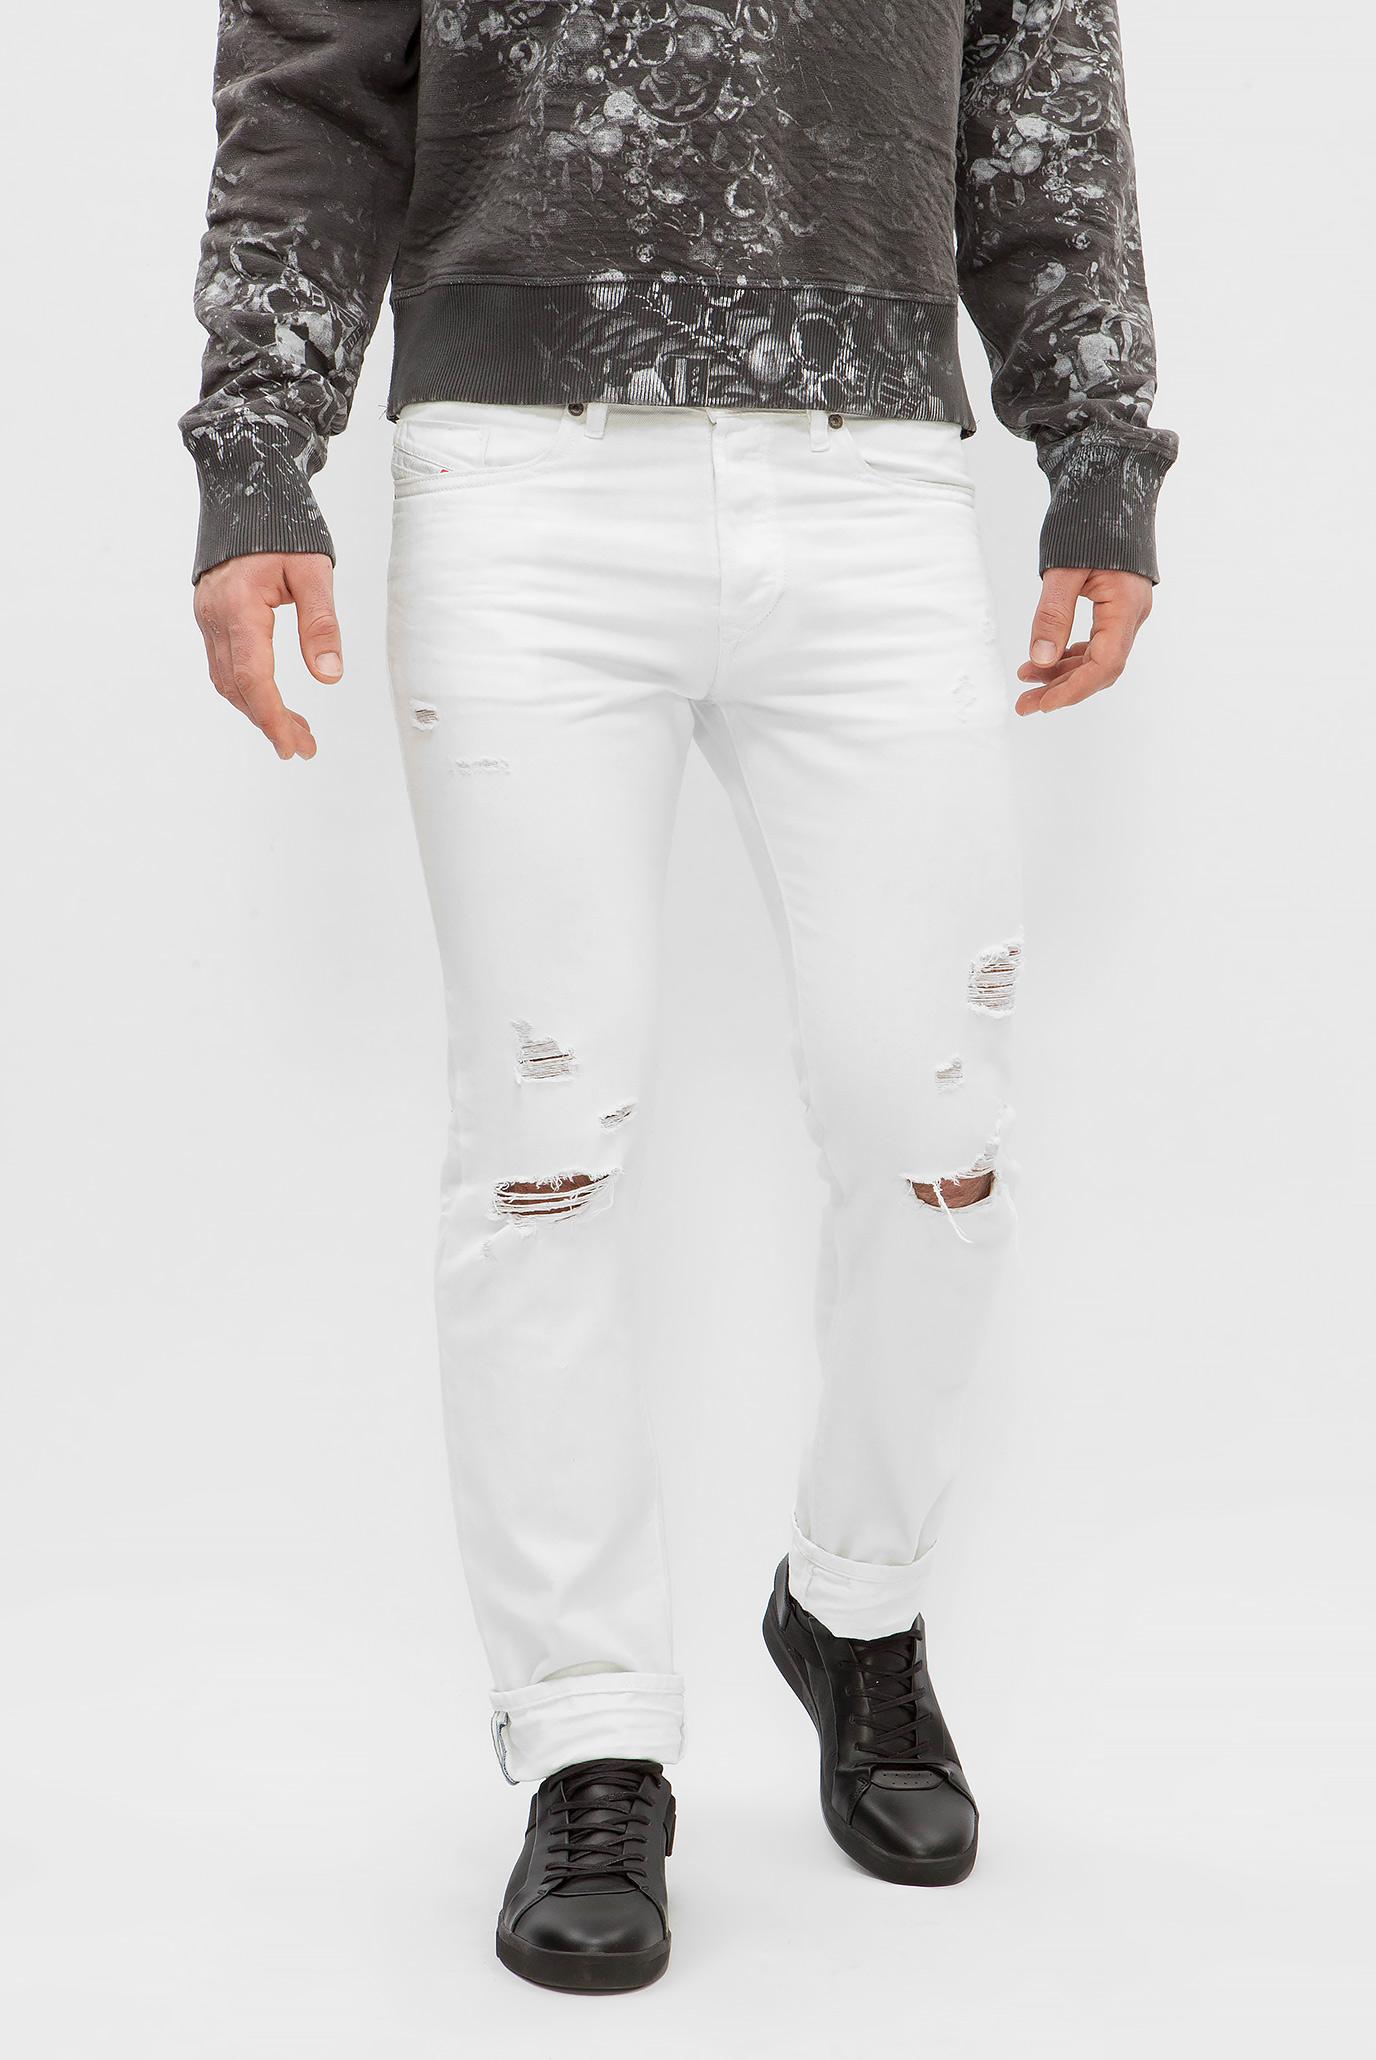 f252313b718 Купить Мужские белые джинсы BUSTER Diesel Diesel 00SDHB 0680K – Киев ...